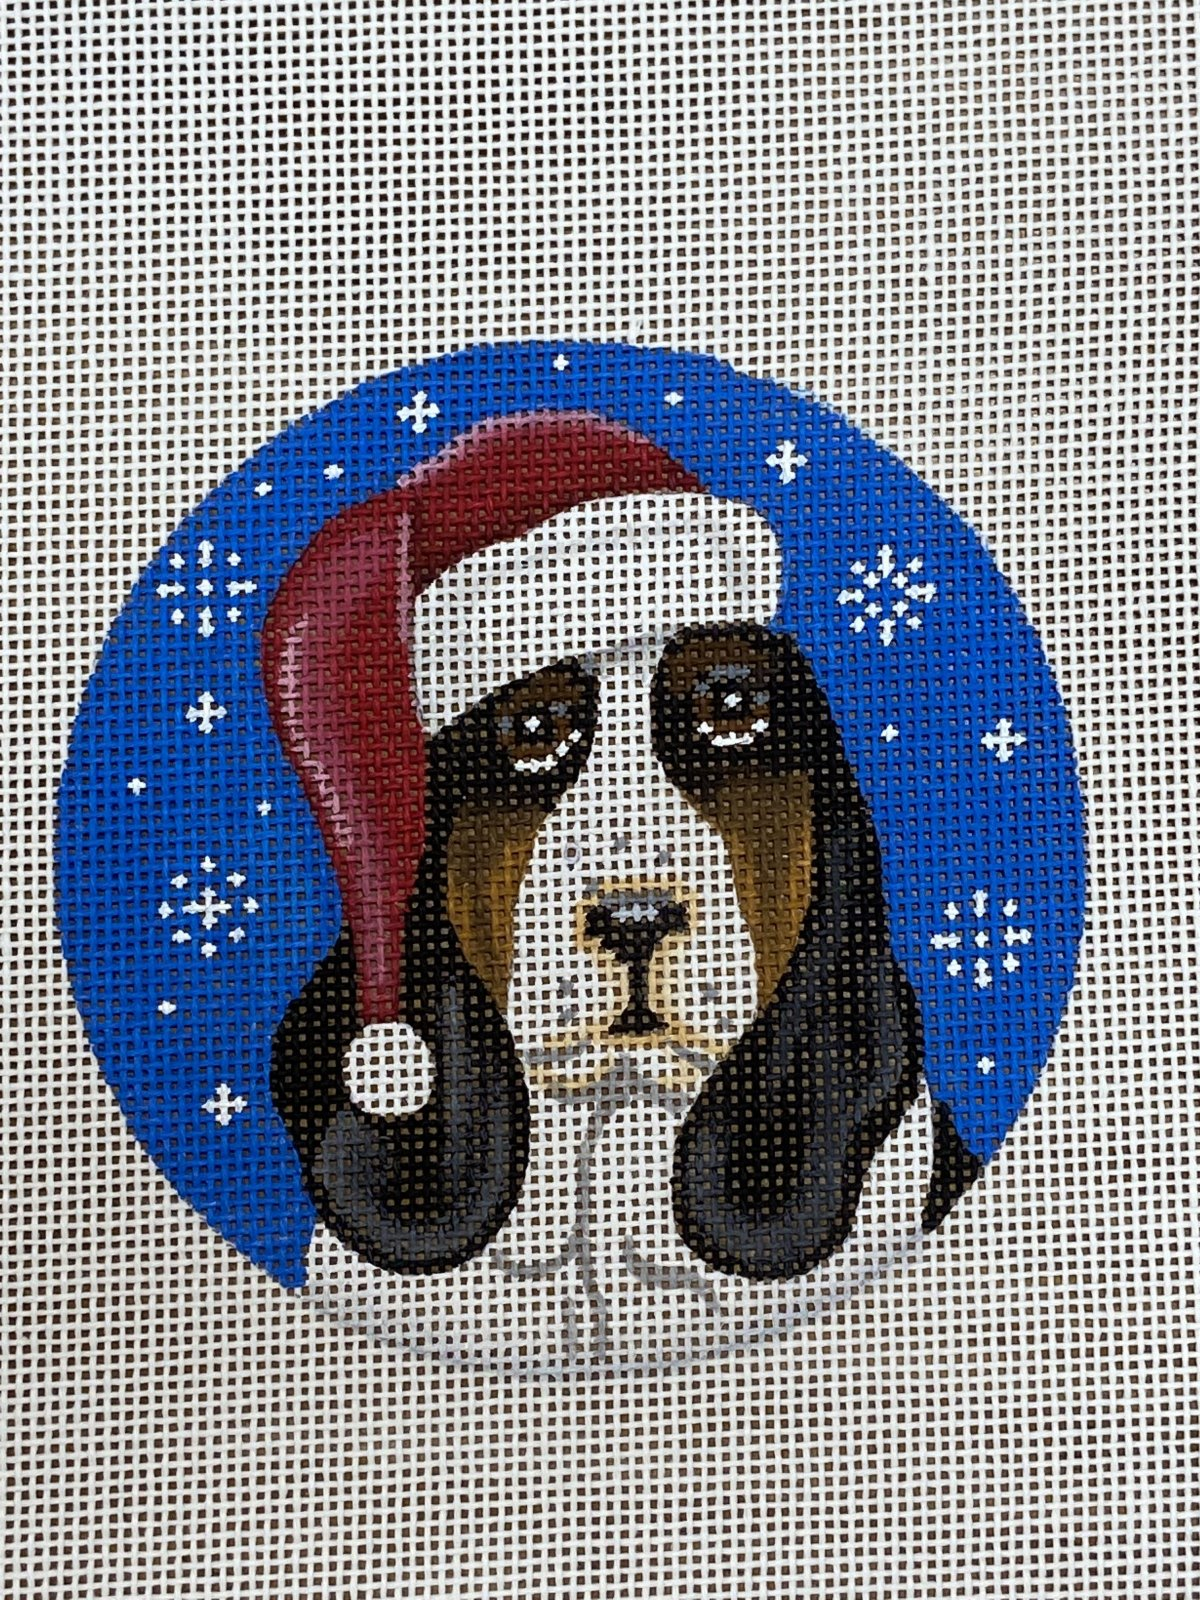 Bassett Hound Santa